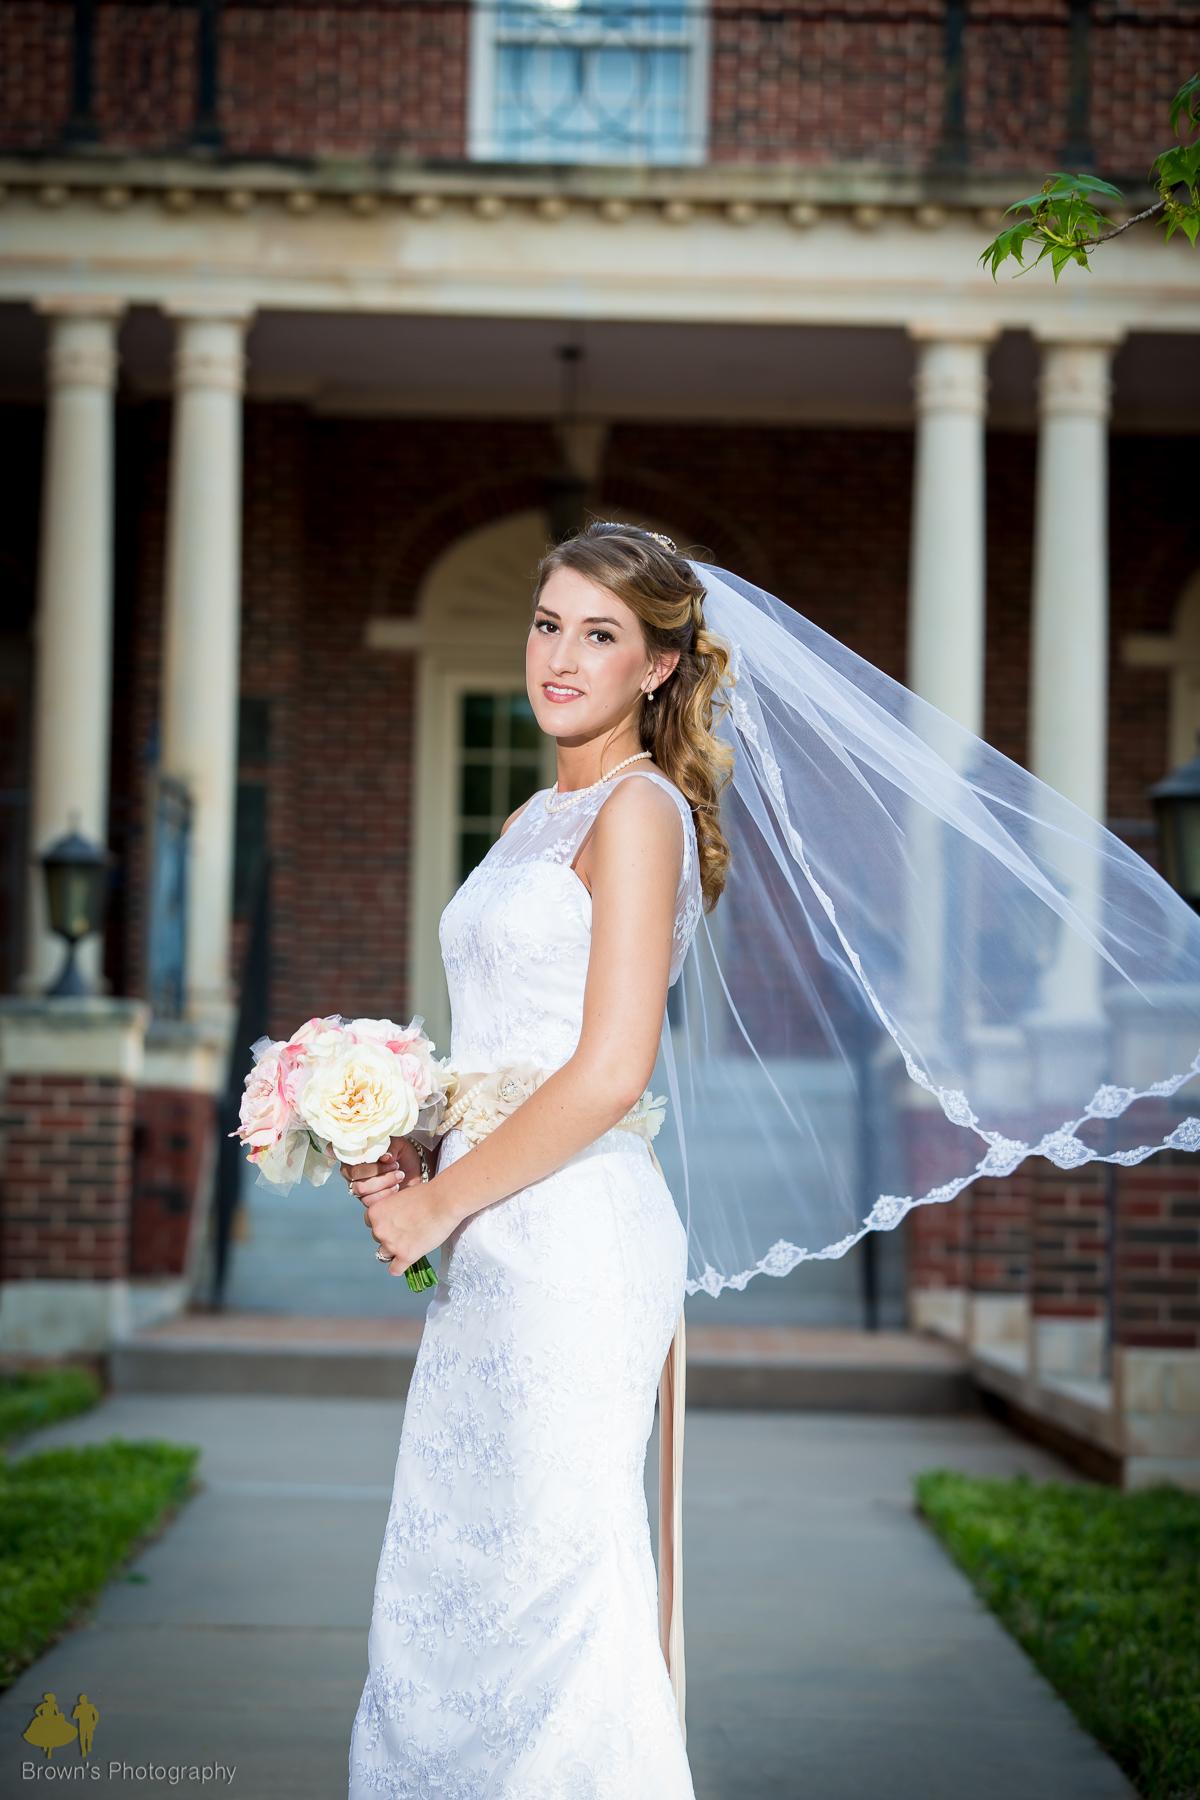 stillwater-wedding-photographer-1-2.jpg